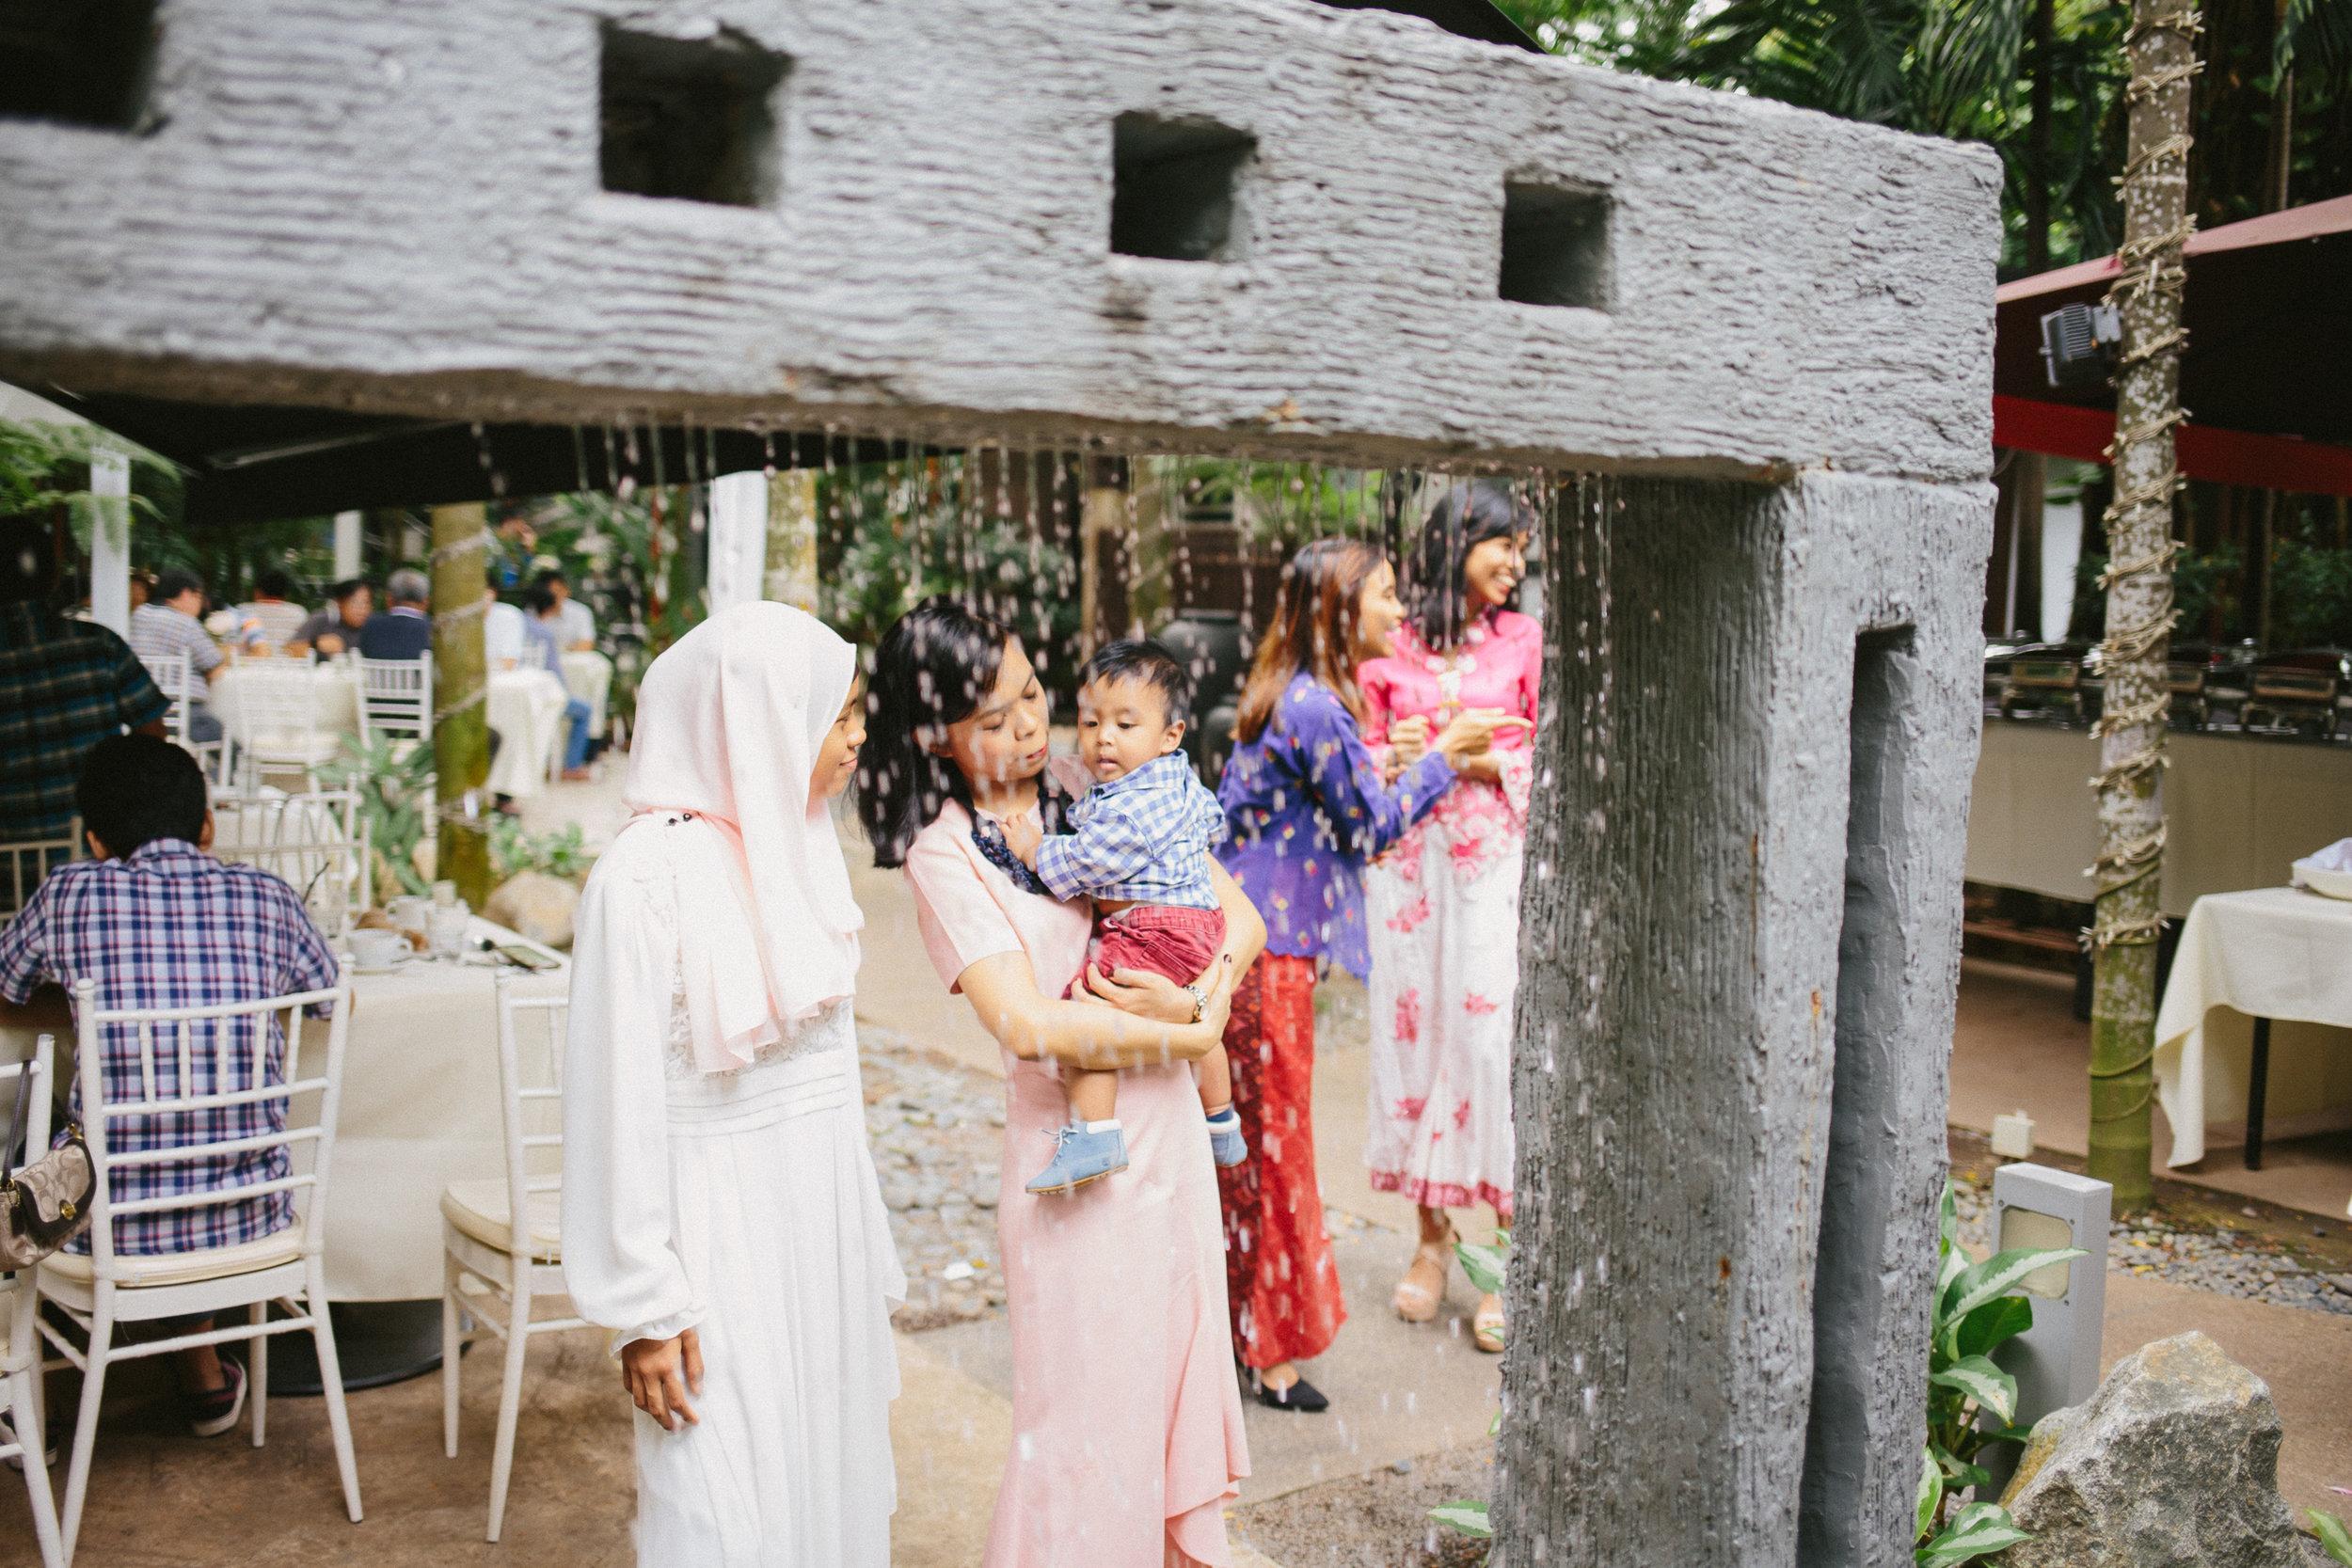 singapore-wedding-photographer-fadilah-kwan-055.jpg